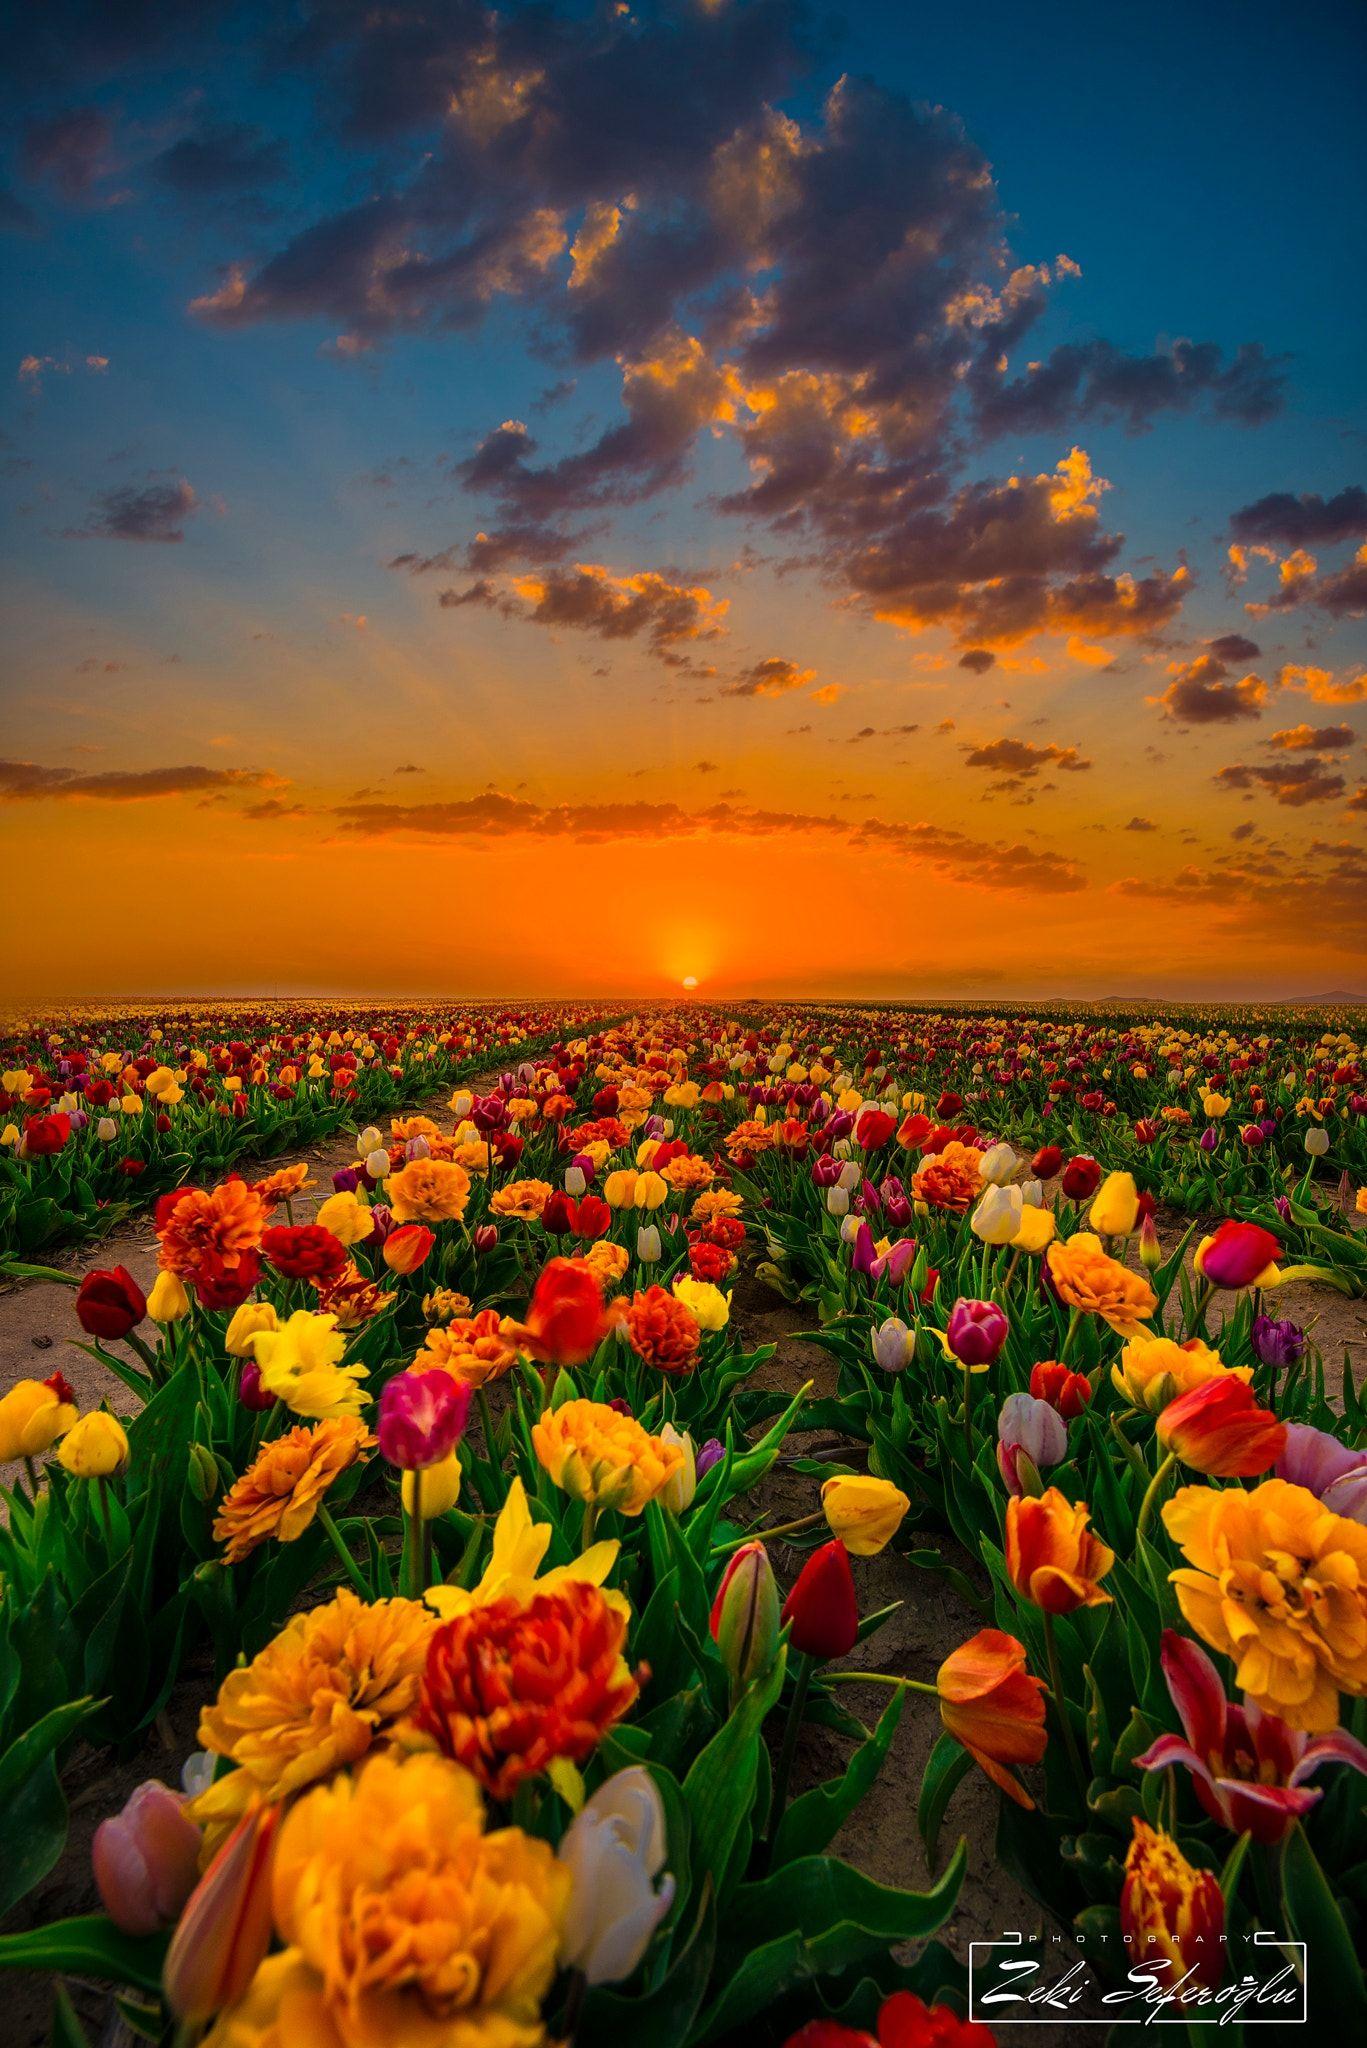 Rainbow Konya Ismil Lale Bahceleri Spring Scenery Landscape Photography Beautiful Nature